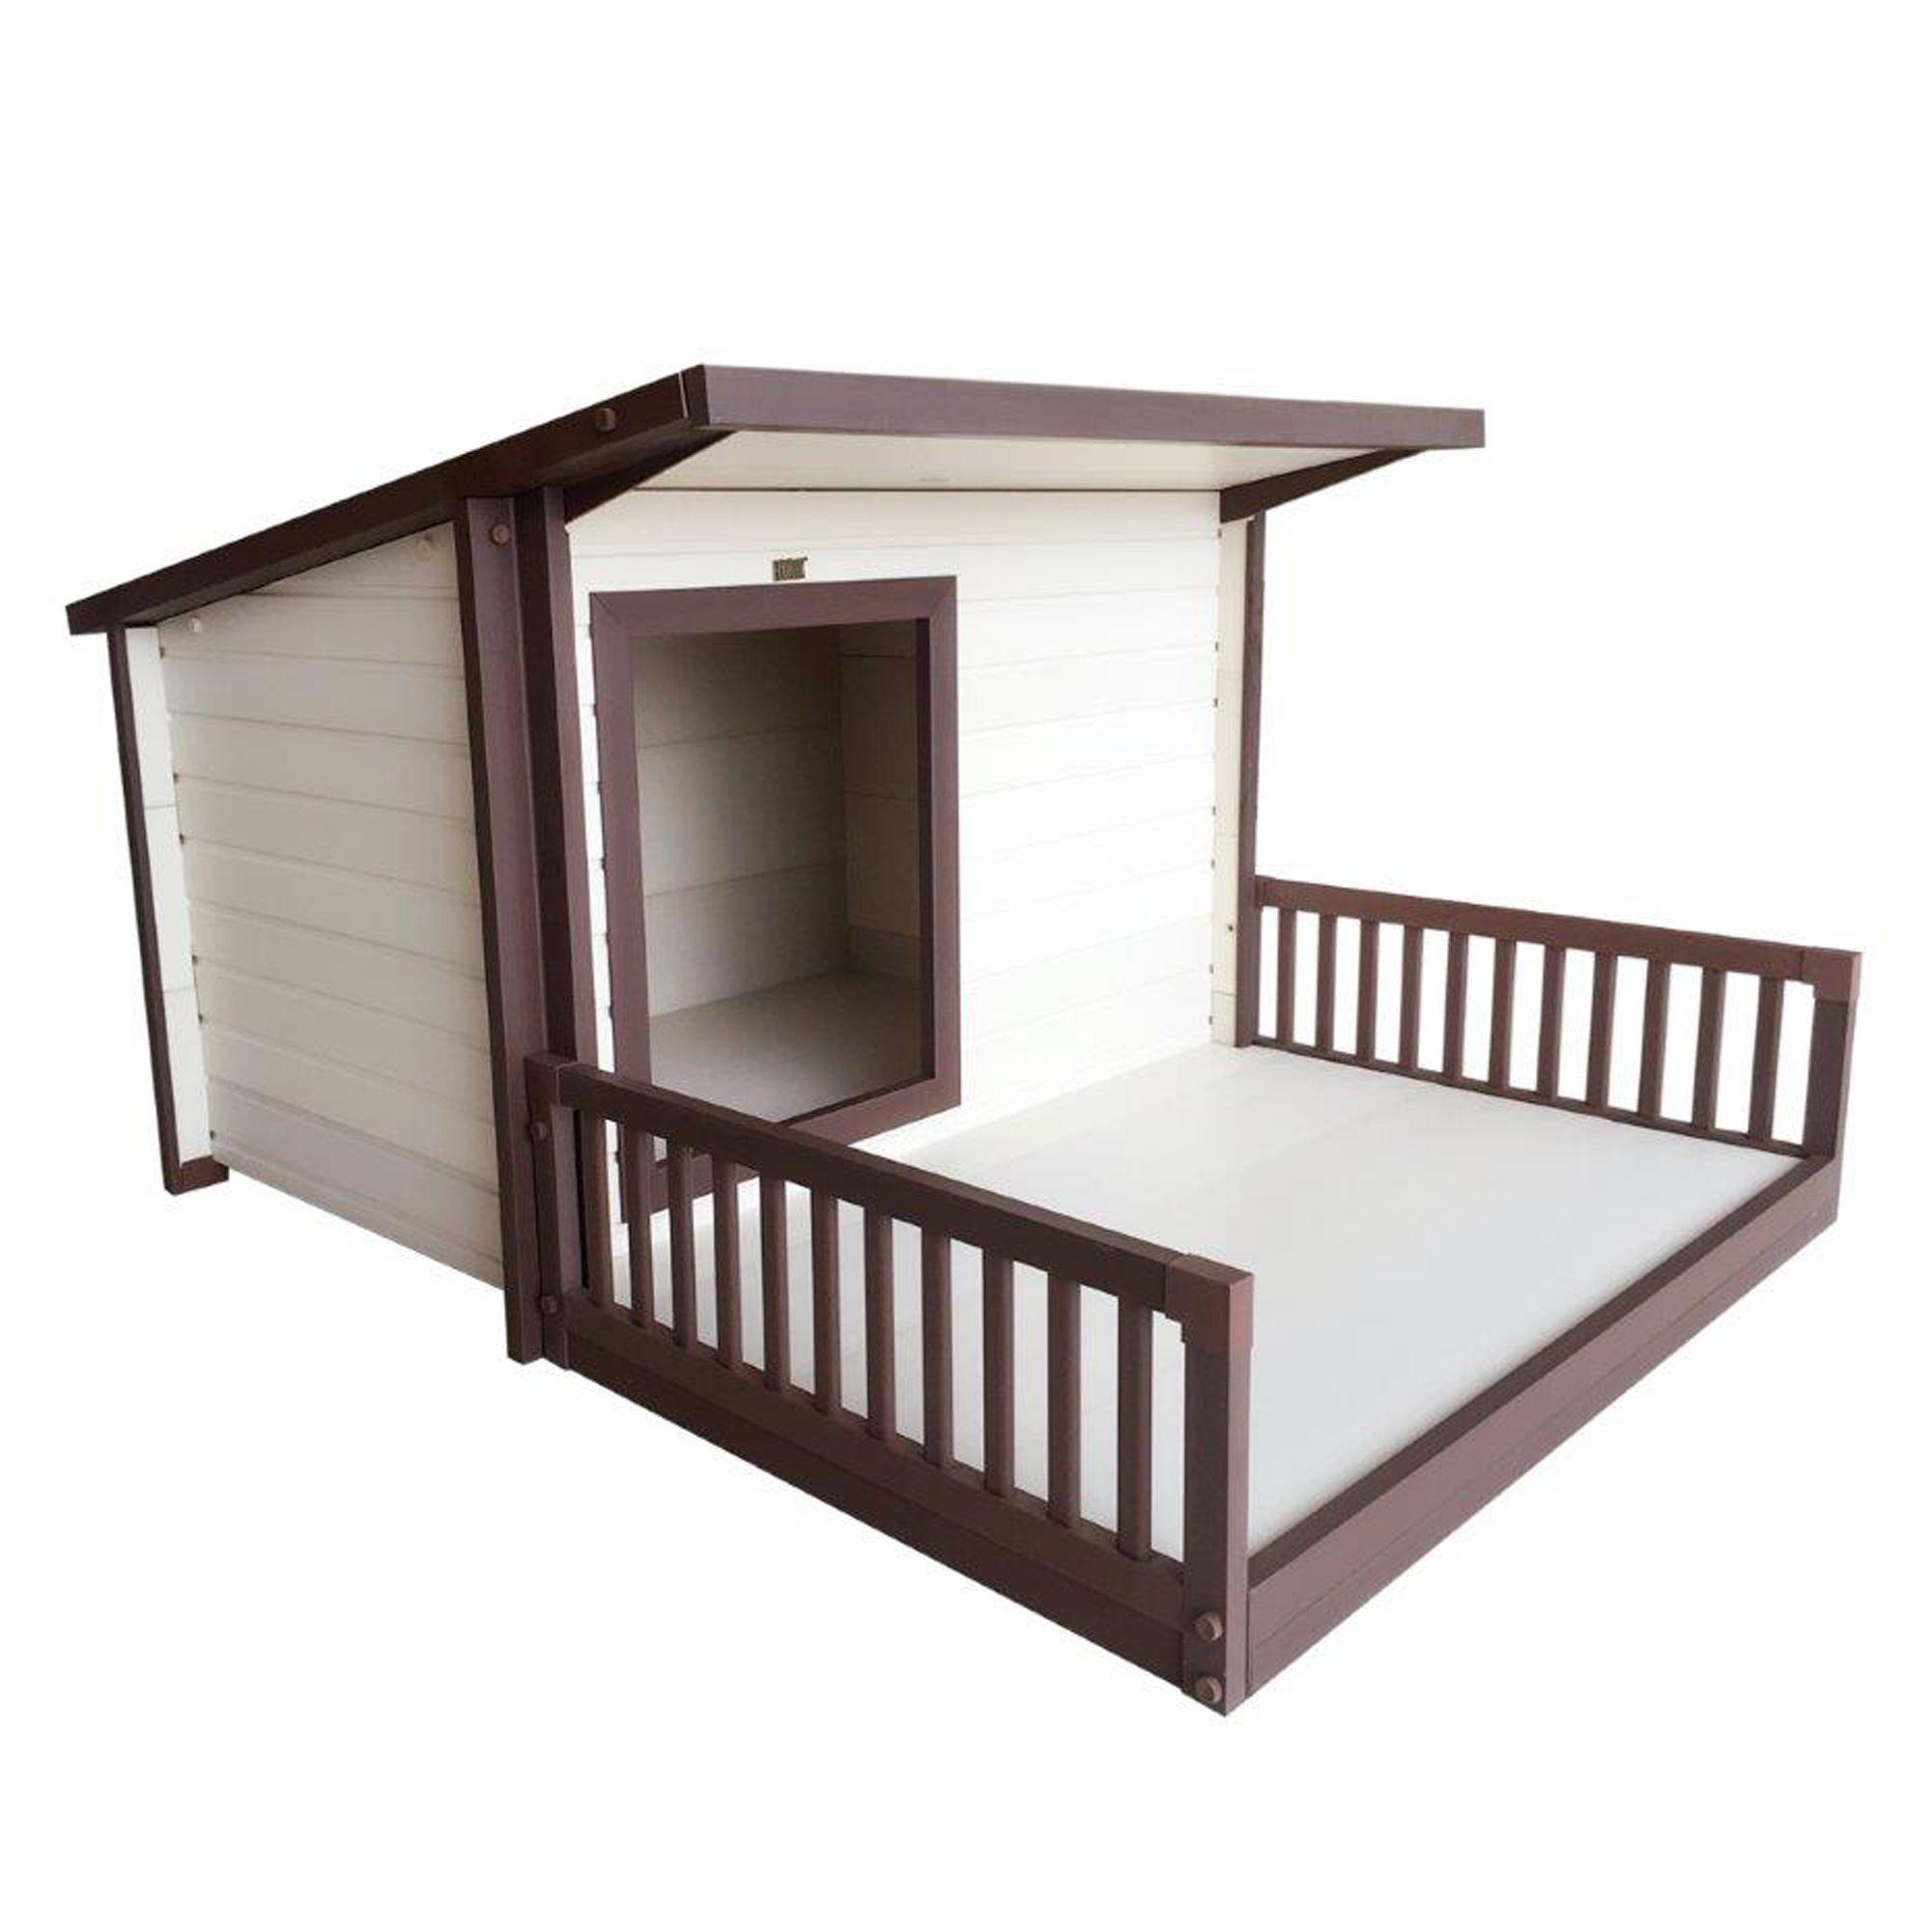 New Age Ecoflex Santa Fe Chalet Dog House Size 54.3l X 42.1w X 30.3h